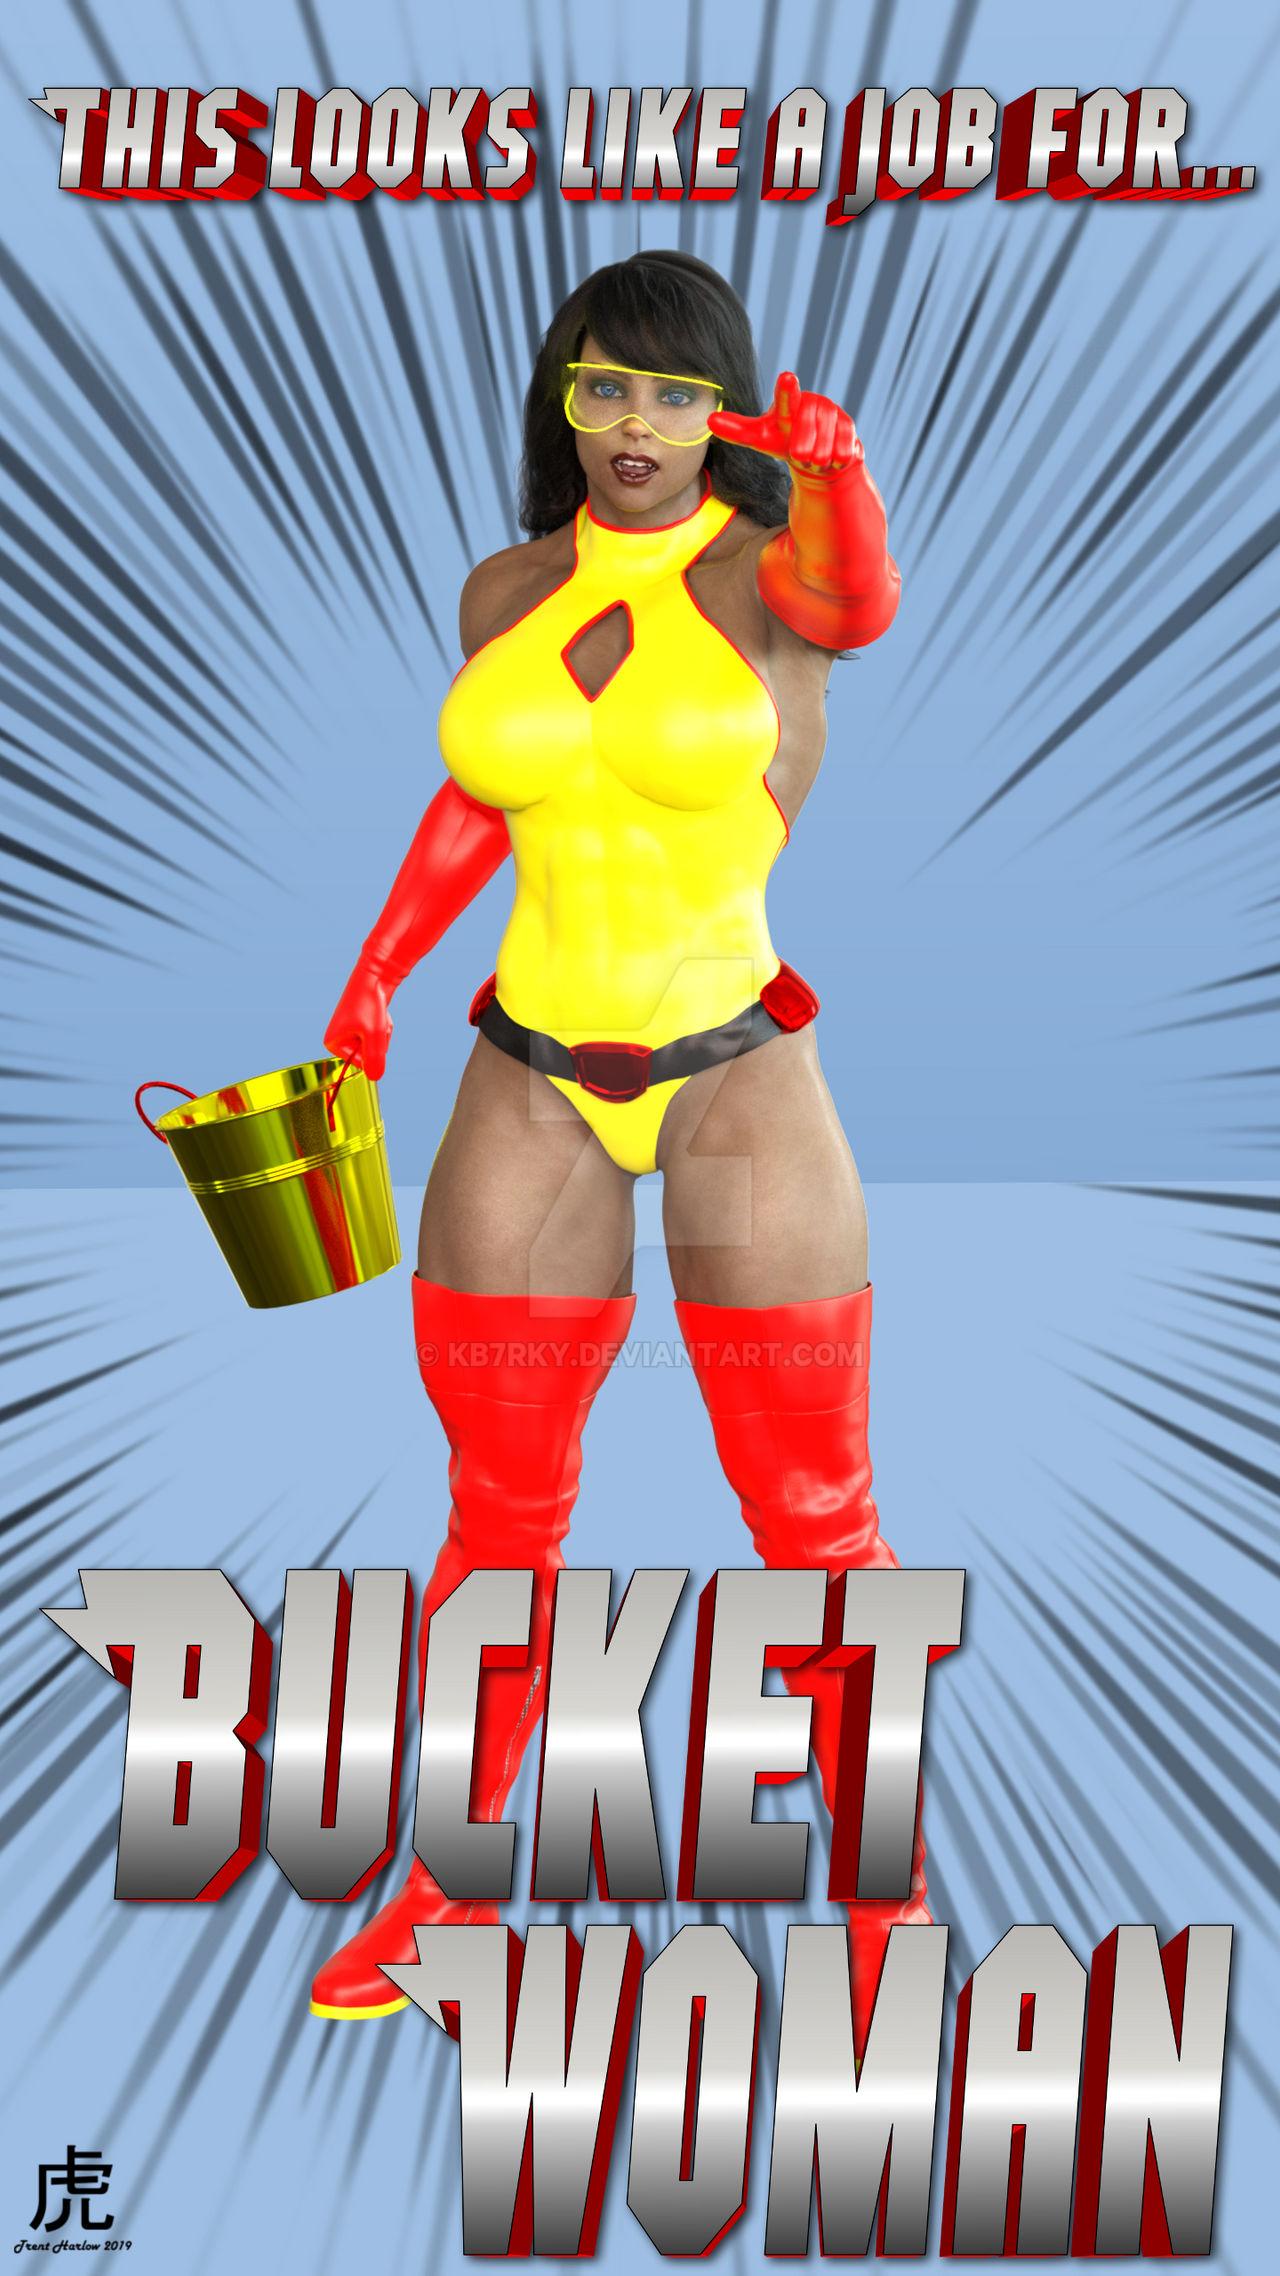 Meet the newest superheroine, Bucketwoman!